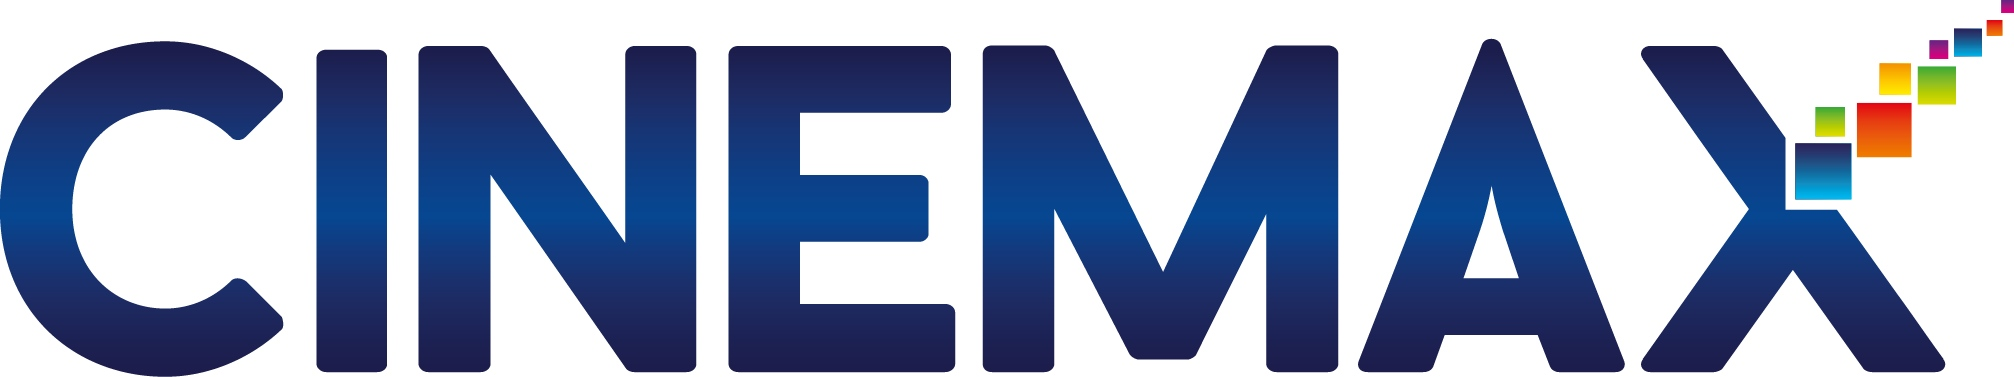 cinemax_logo_2015_final